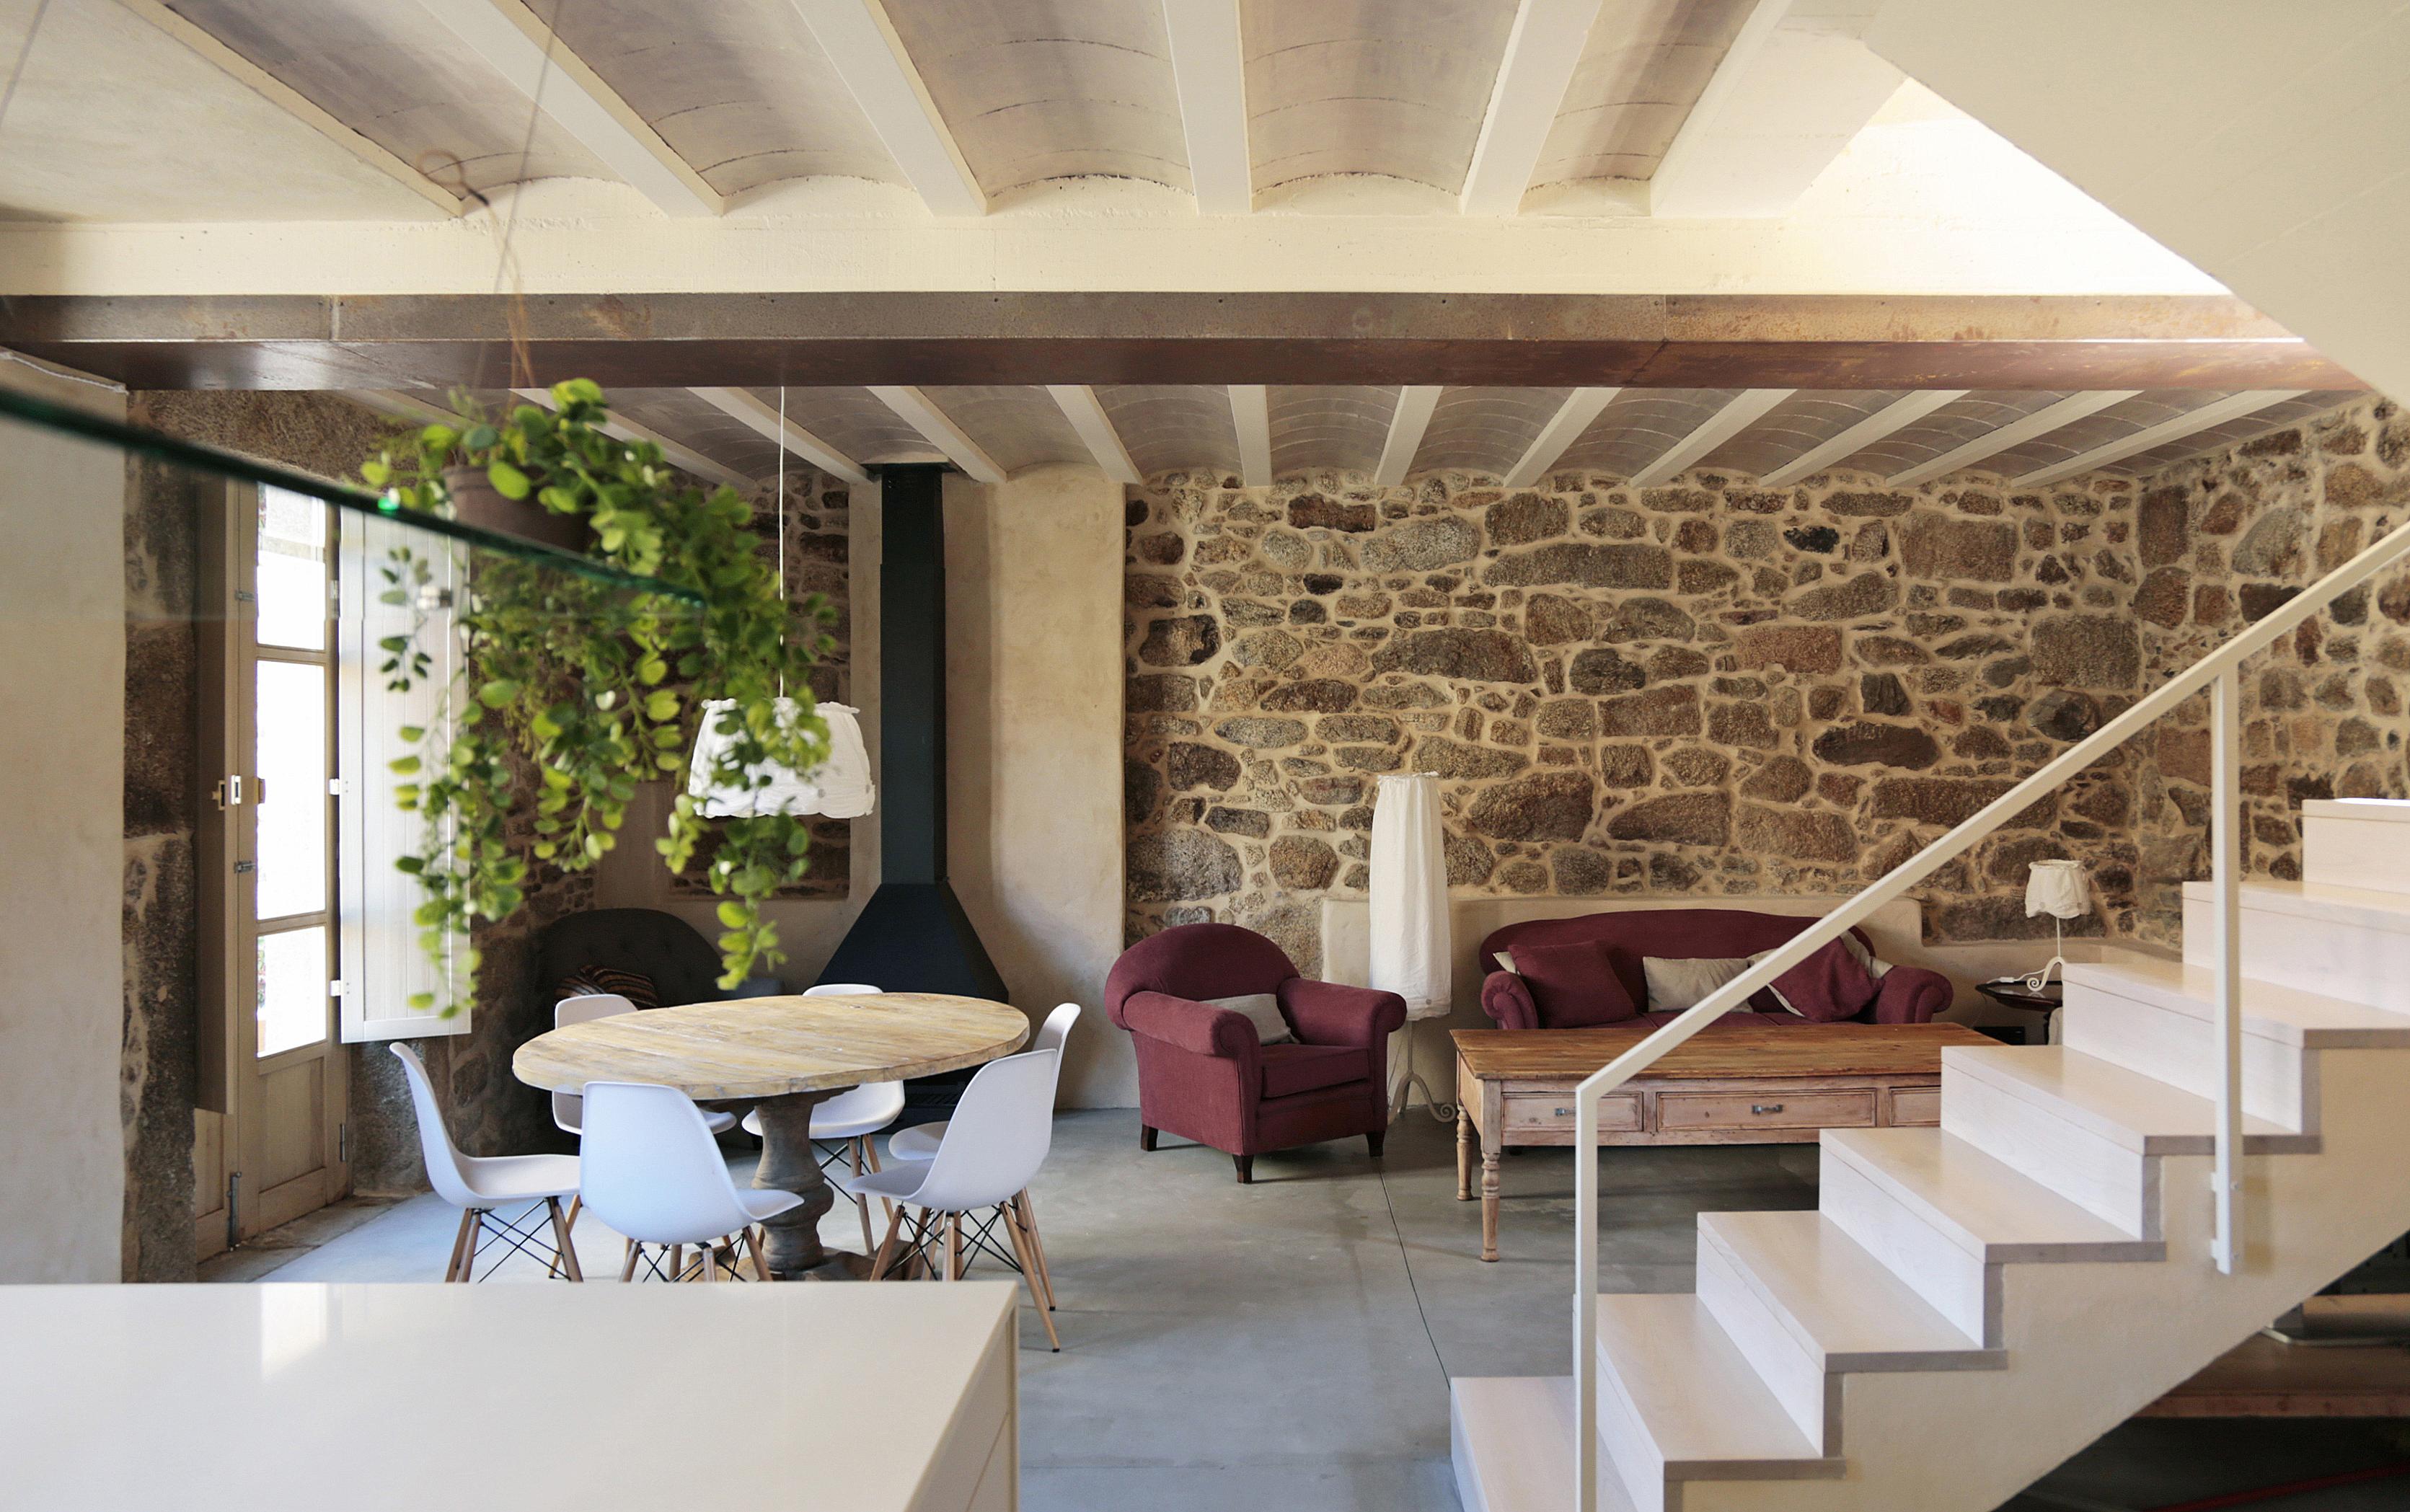 Rehabilitaci n de una casa en carnota dom arquitectura Rehabilitacion de casas antiguas